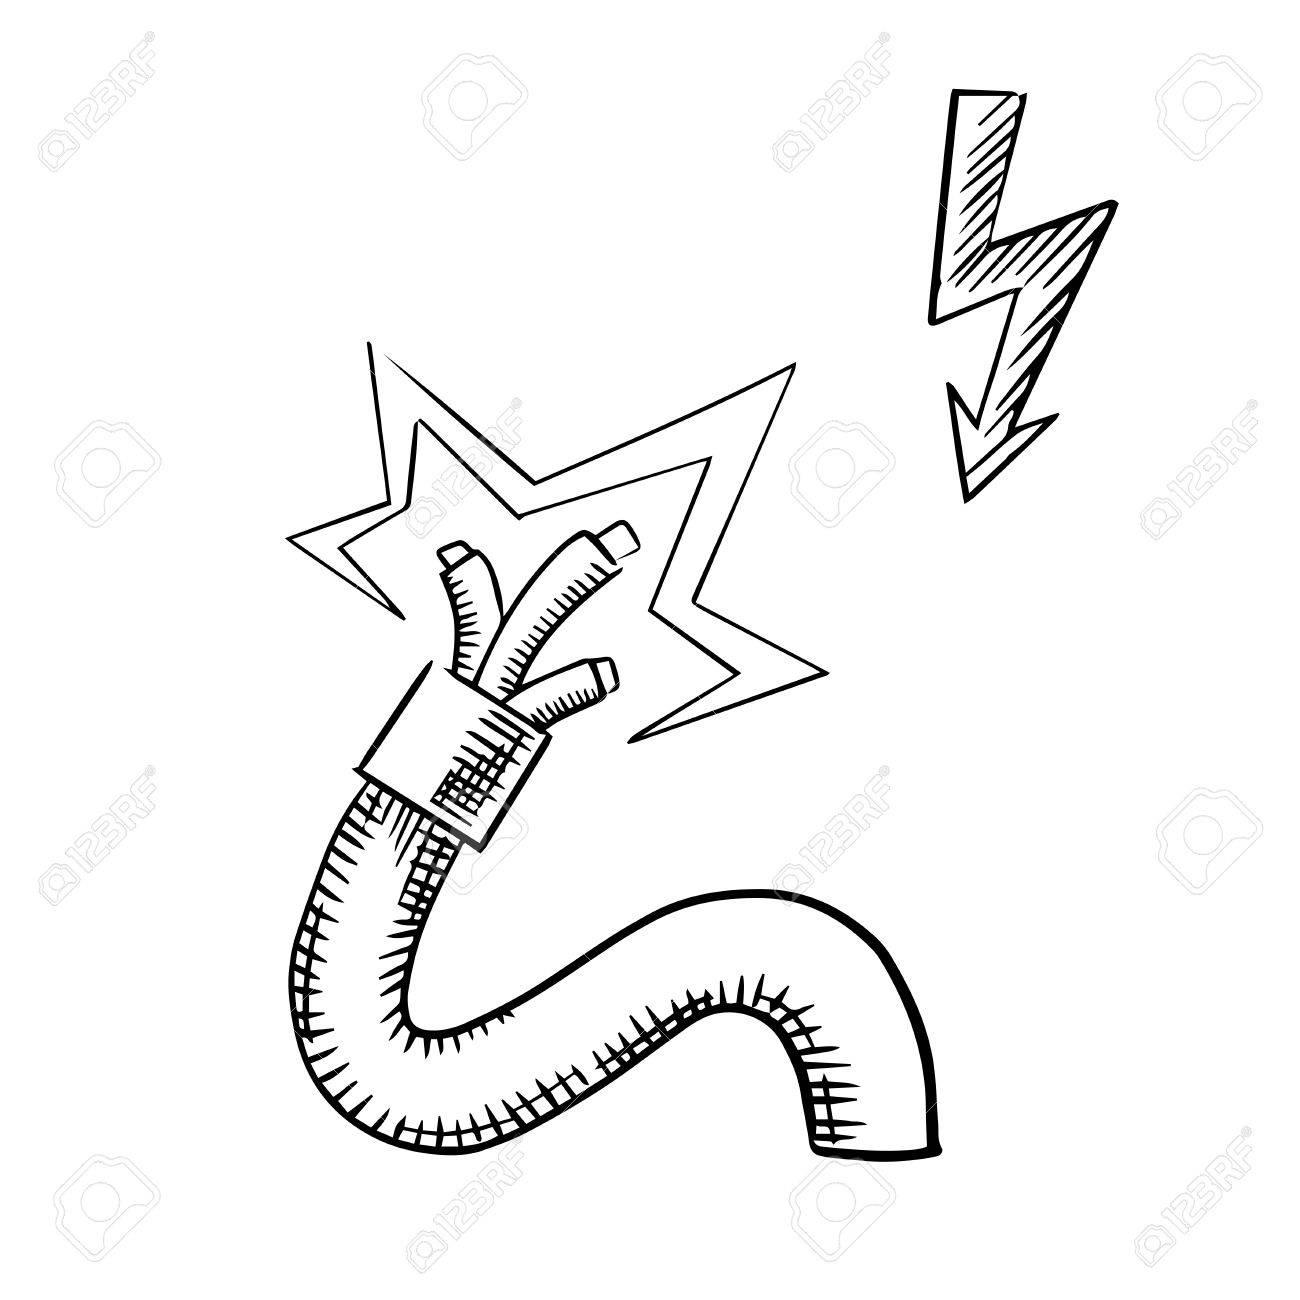 Fantastic cartoon man in wires mold electrical diagram ideas